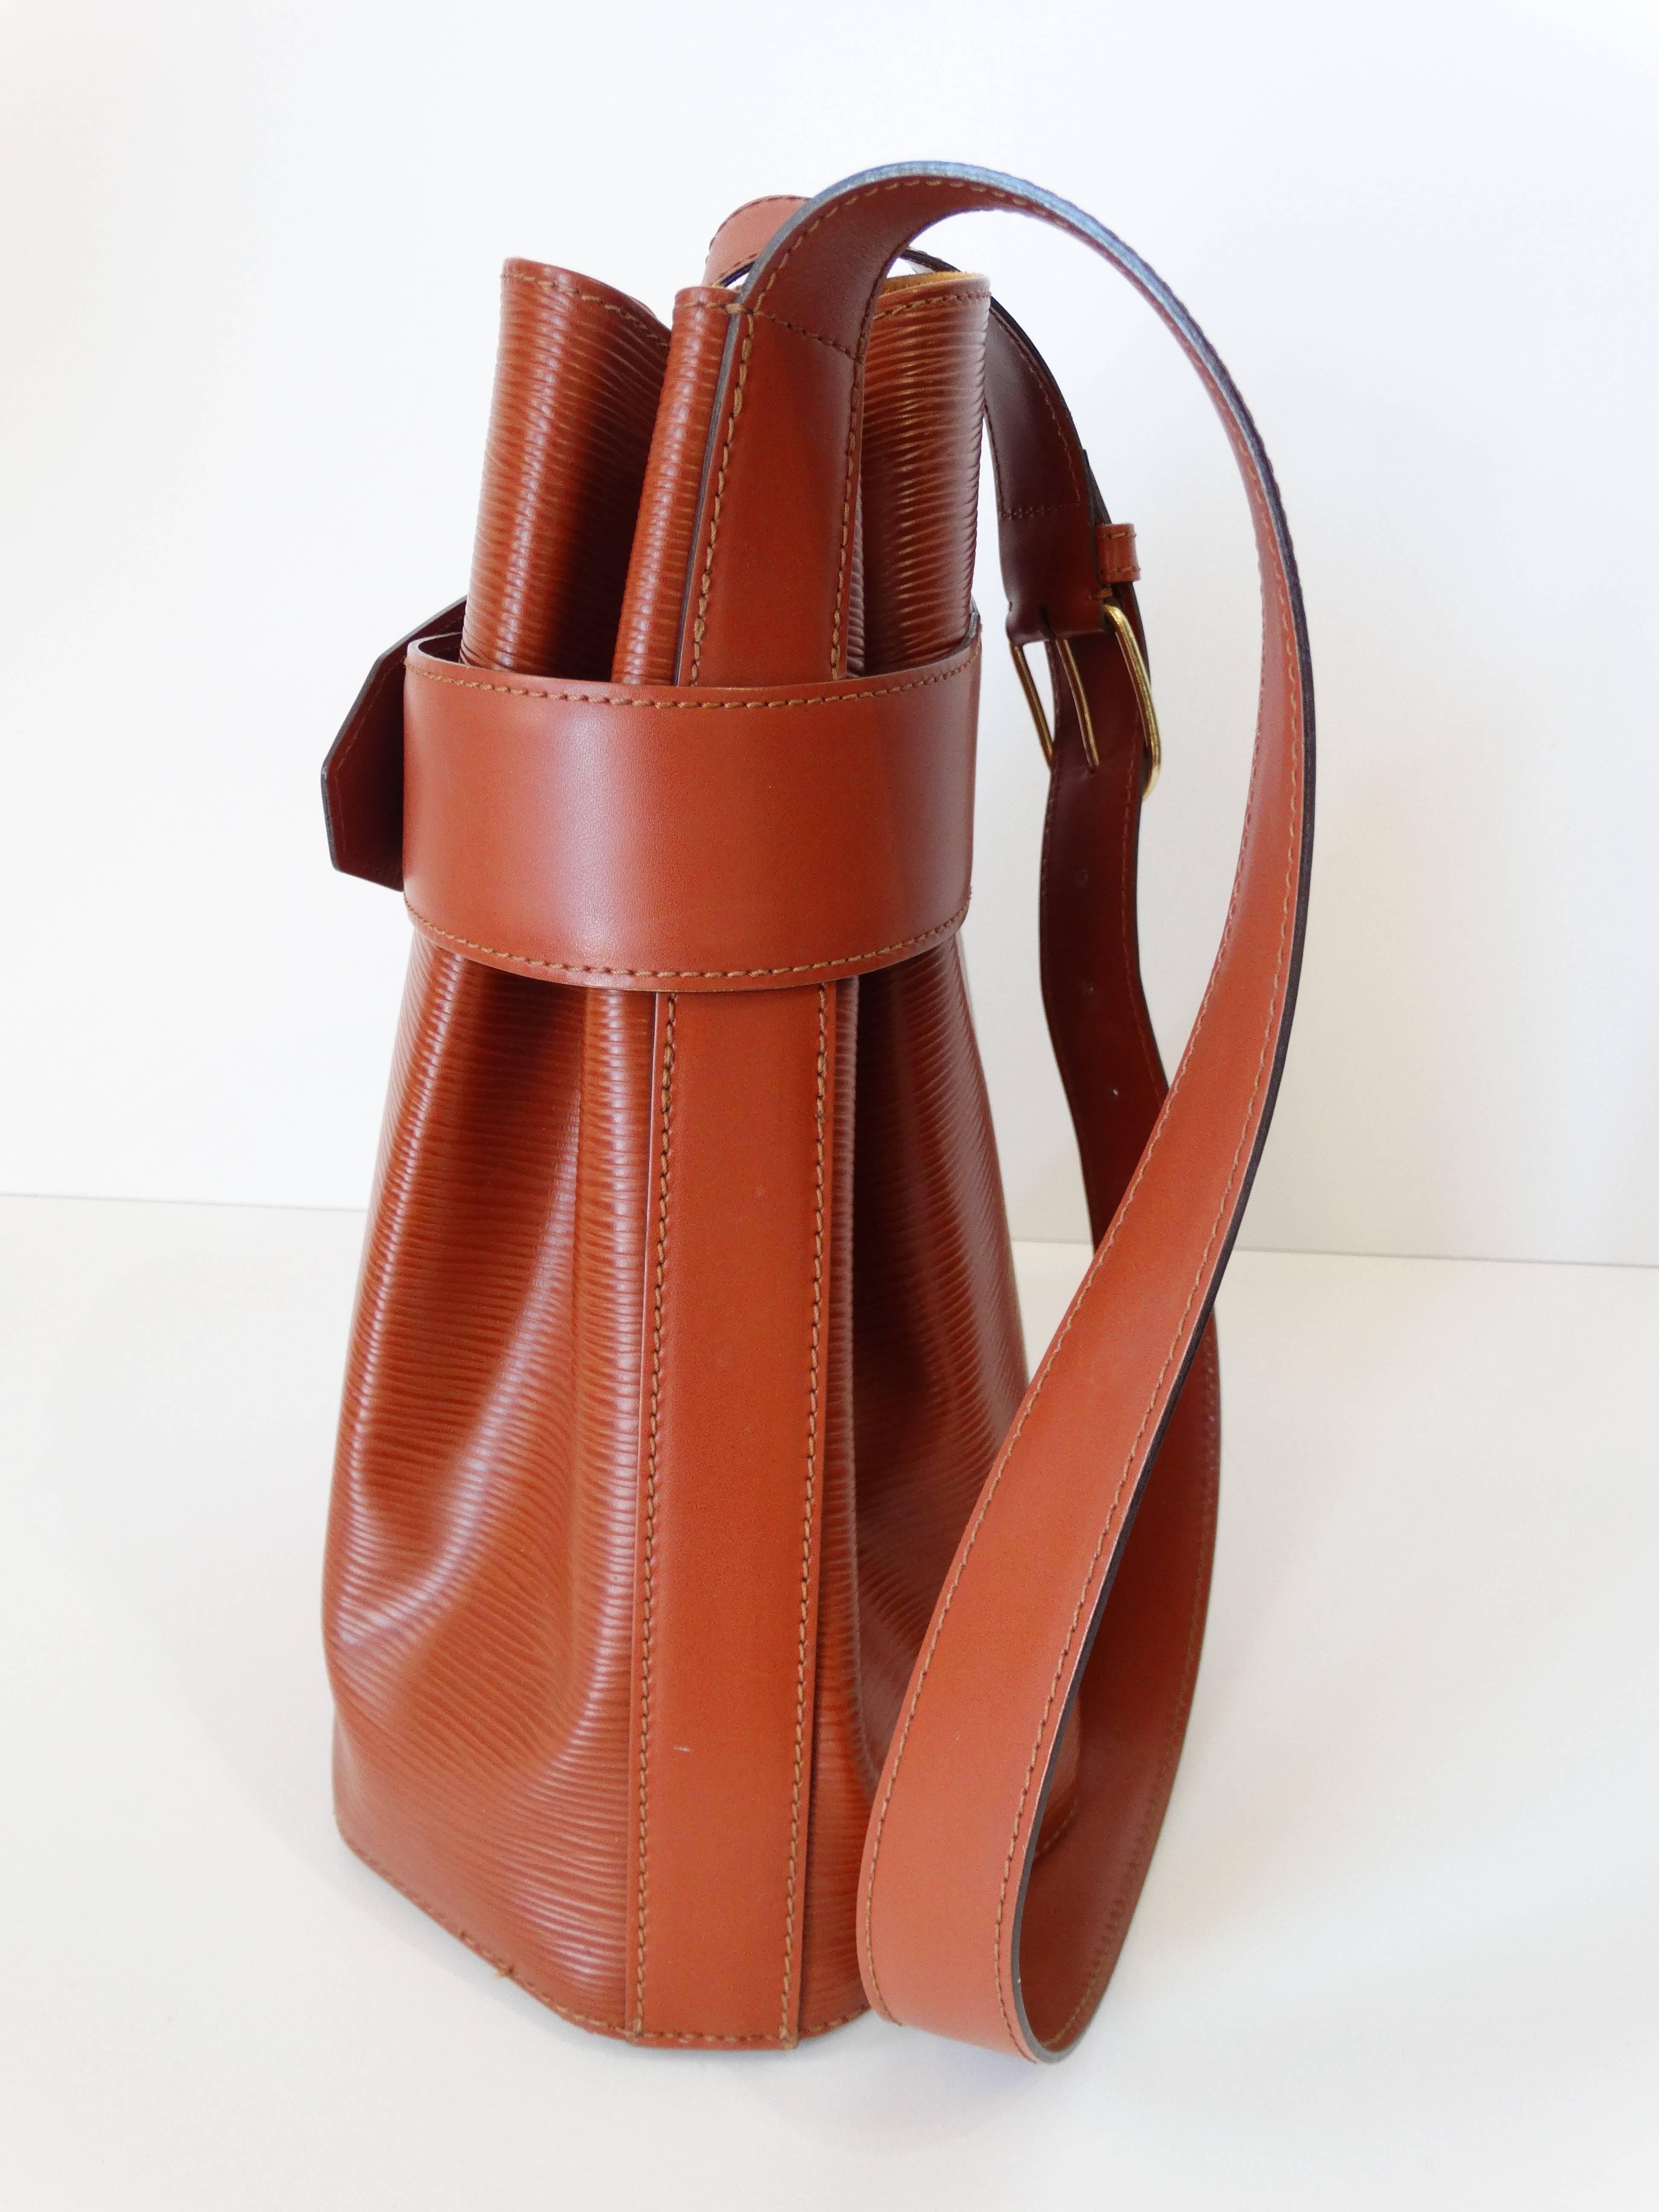 ed8833e7808d Rare !990s Louis Vuitton Epi Leather Bucket Bag at 1stdibs